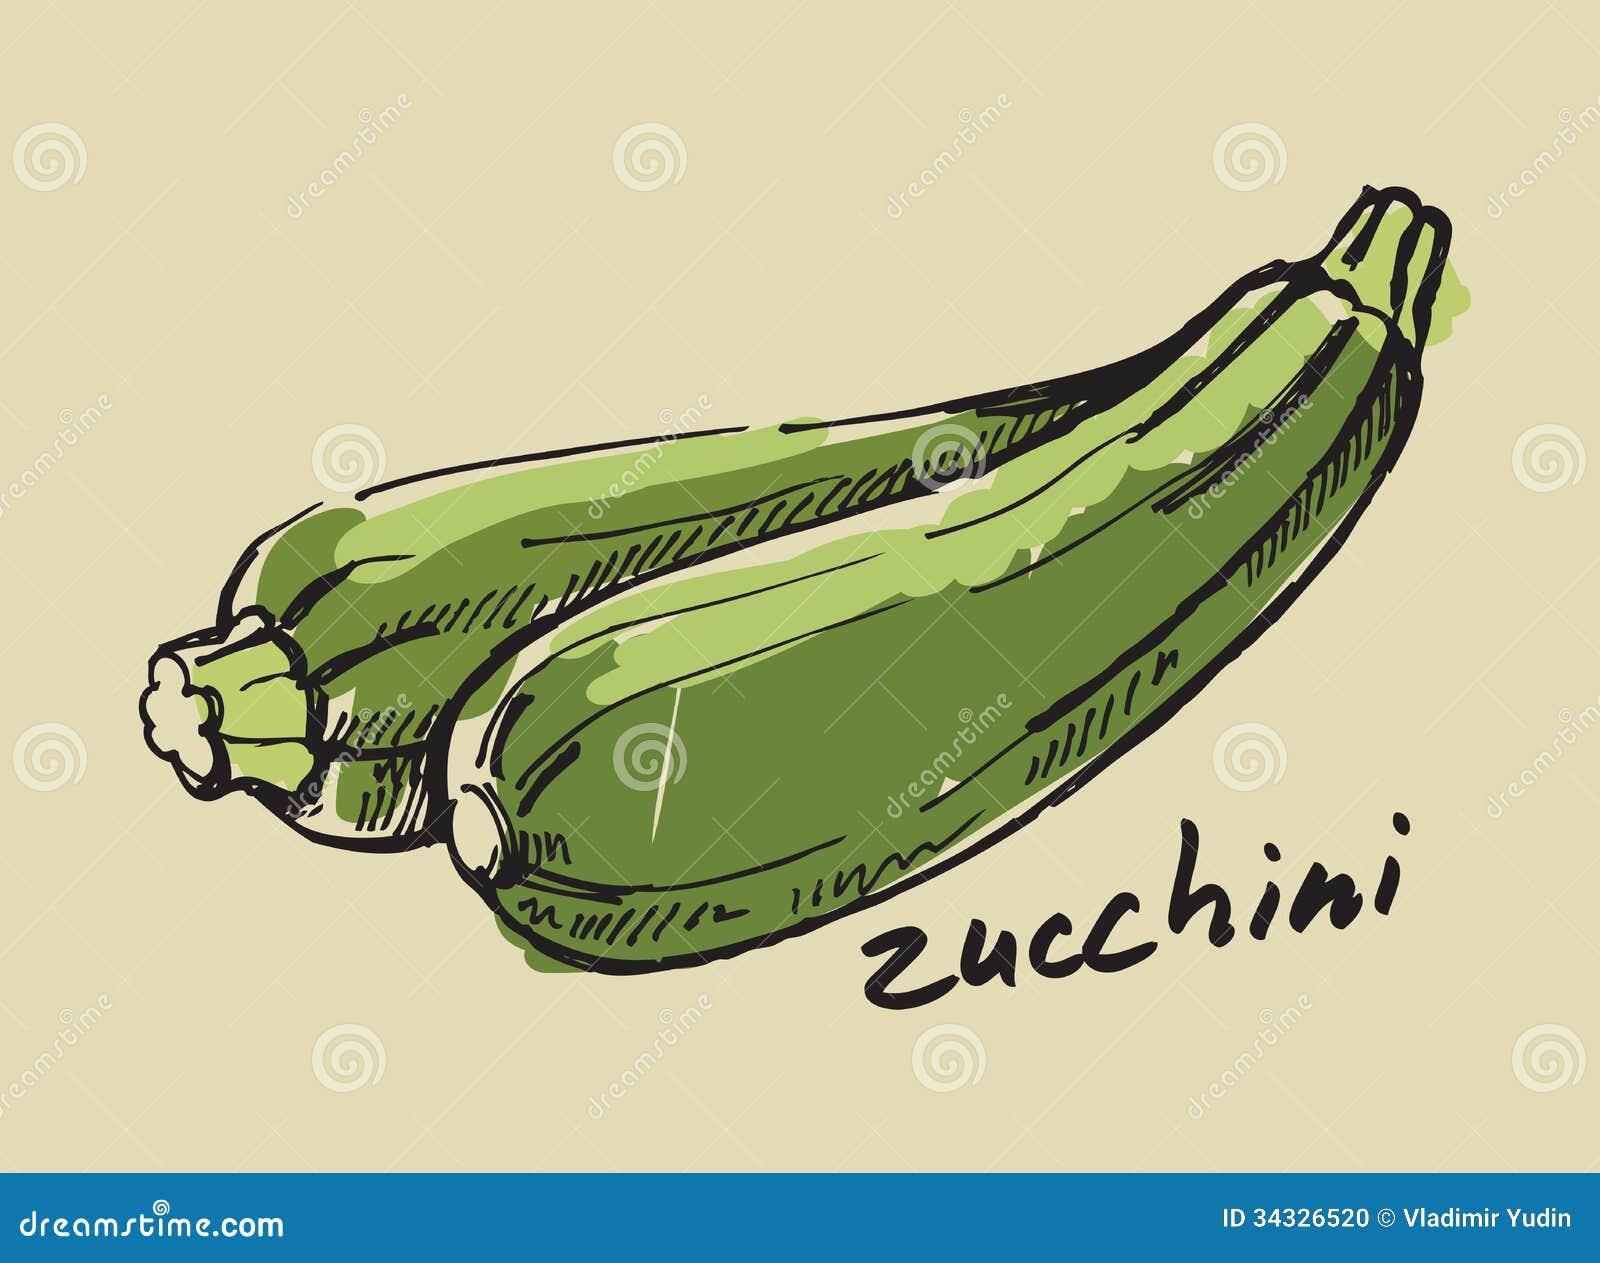 Computer Kitchen Design Hand Drawn Zucchini Stock Photo Image 34326520